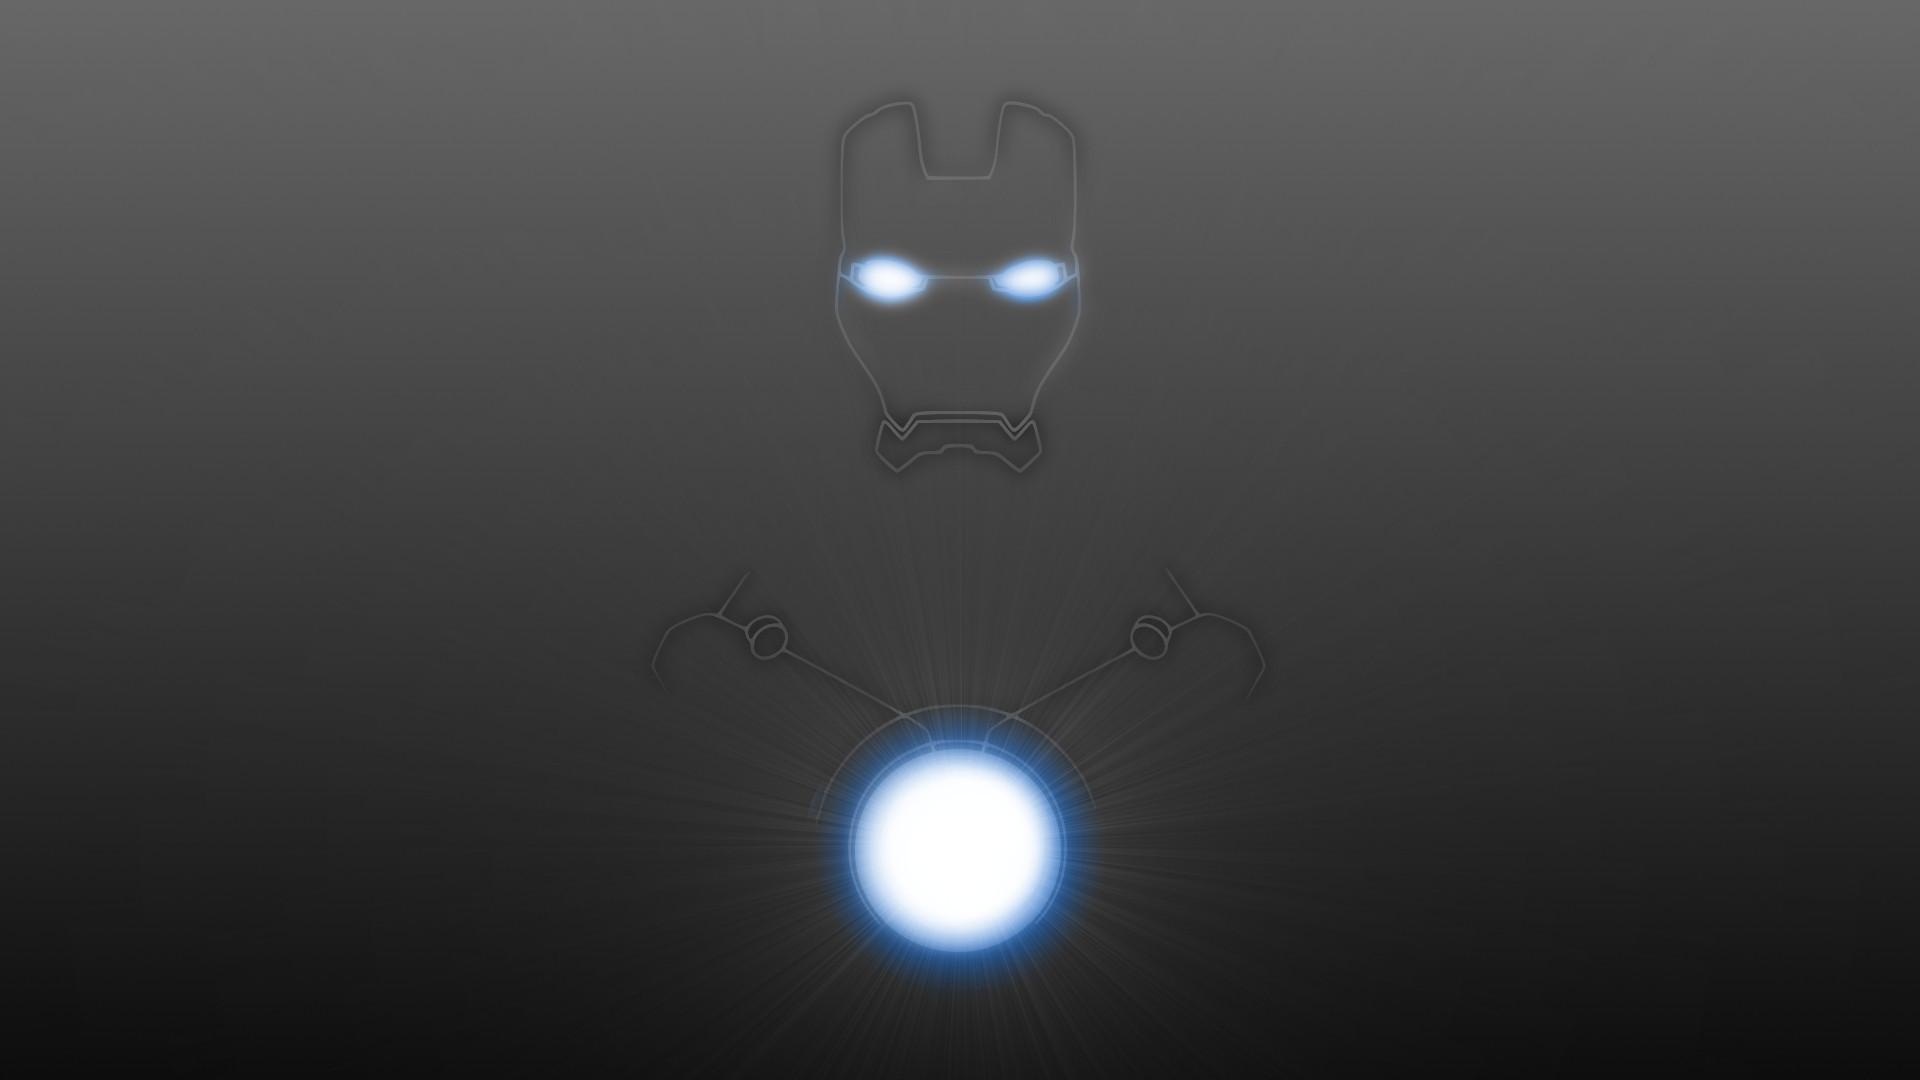 1920x1080 ... Iron Man Wallpaper Live The Wallpaper; Arc Reactor Wallpaper  Hd Wallpapersafari .